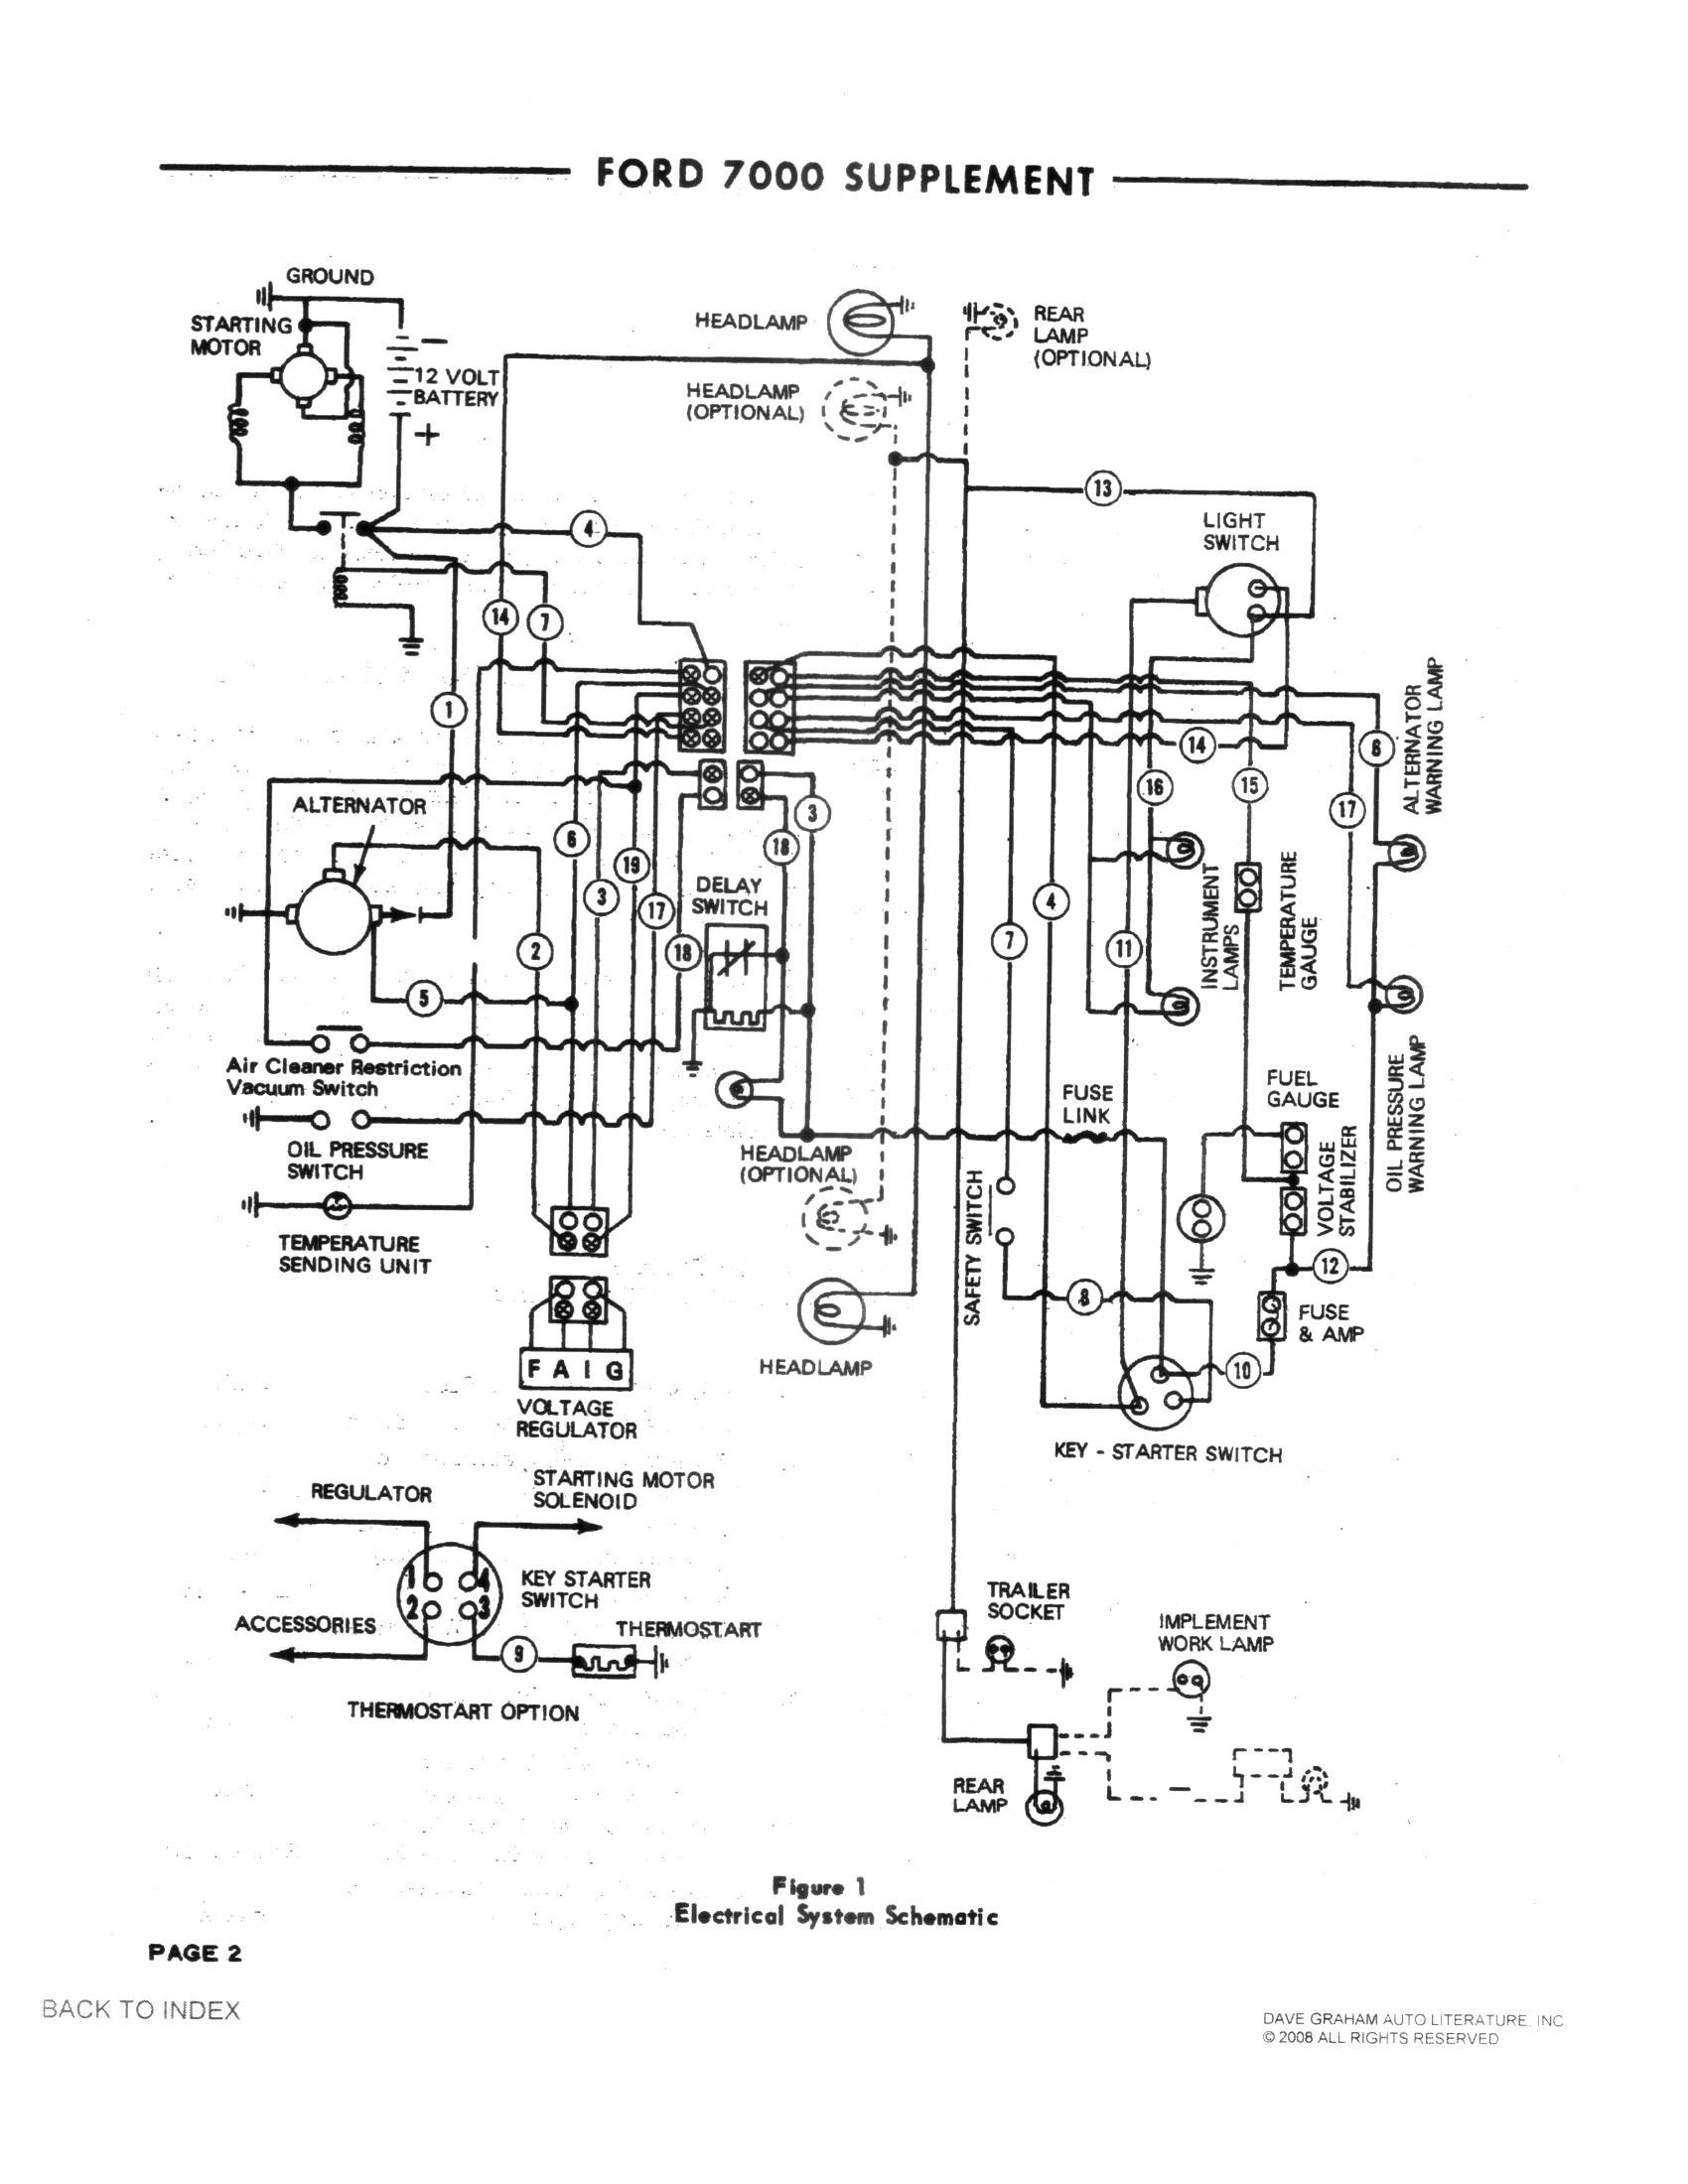 small resolution of motorola alternator wiring diagram john deere wiring diagram hostunique motorola alternator wiring diagram john deere diagrams